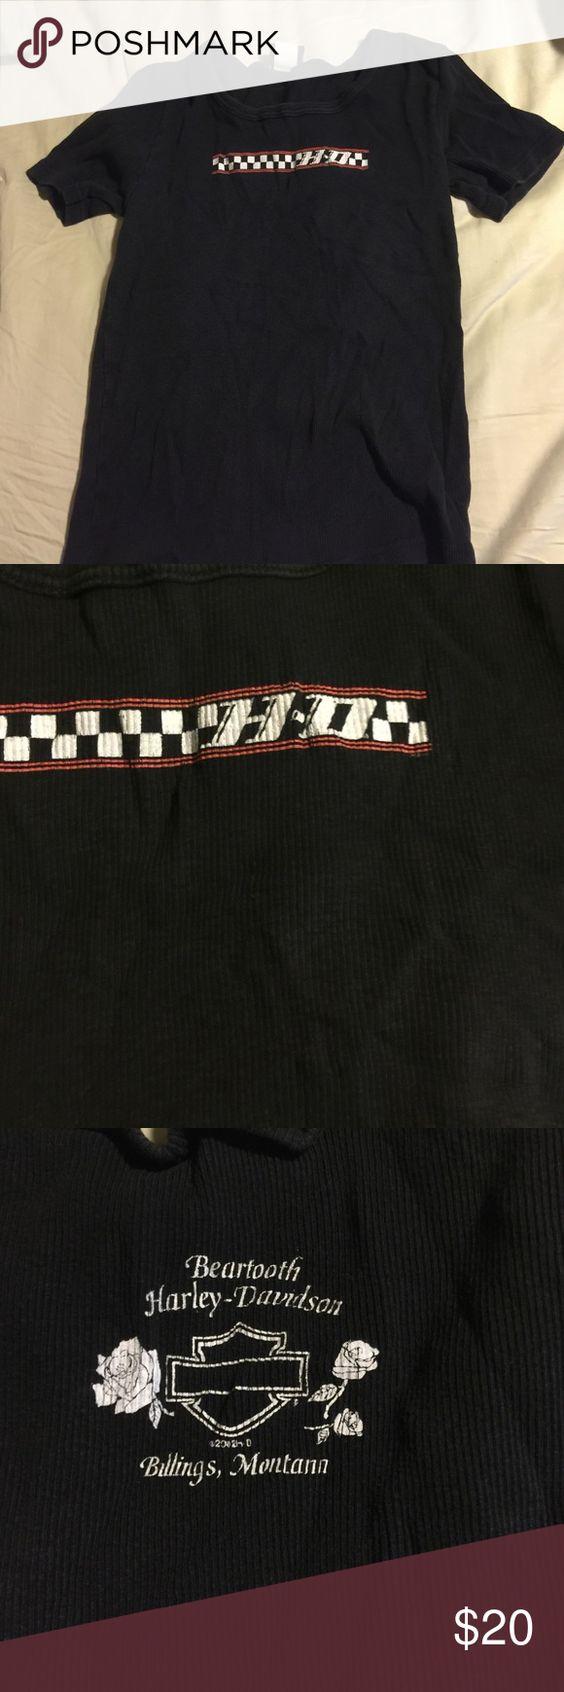 Harley Davidson shirt In great condition! Harley-Davidson Tops Tees - Short Sleeve